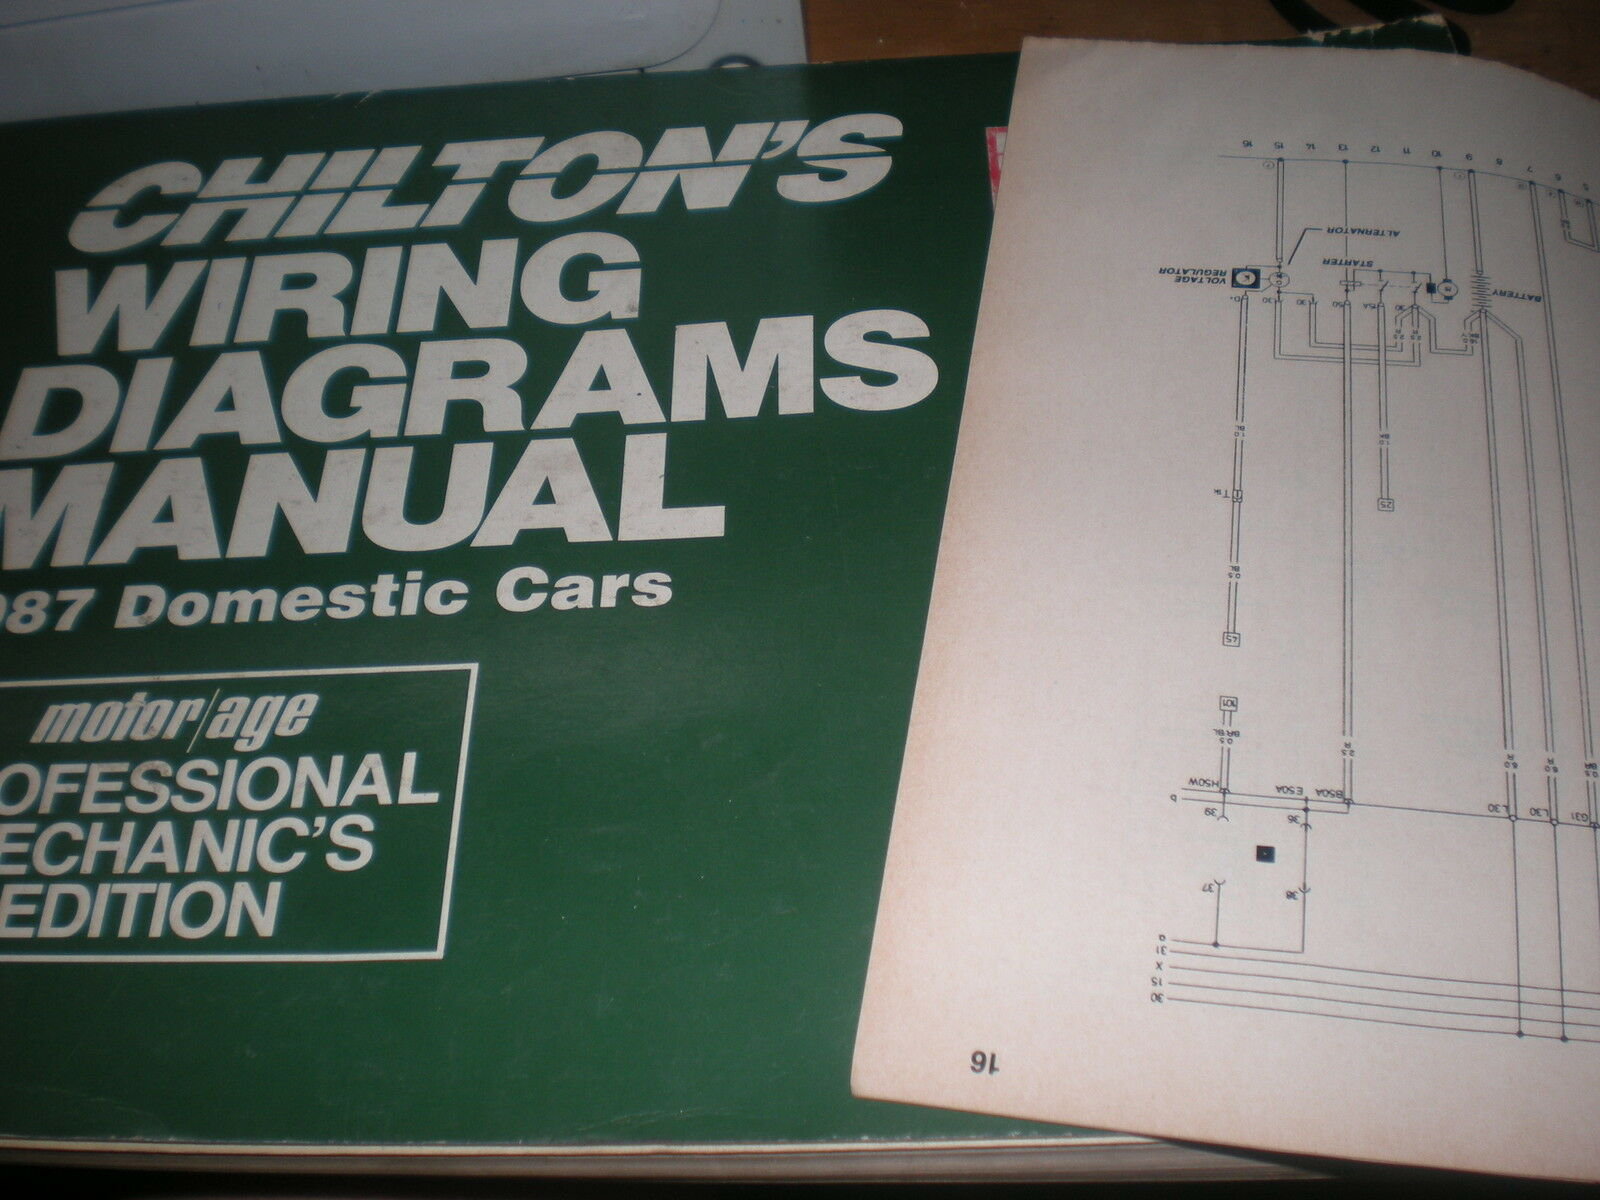 87 corvette wiring diagram free download 1987 chevrolet corvette wiring diagrams schematics manual sheets  1987 chevrolet corvette wiring diagrams